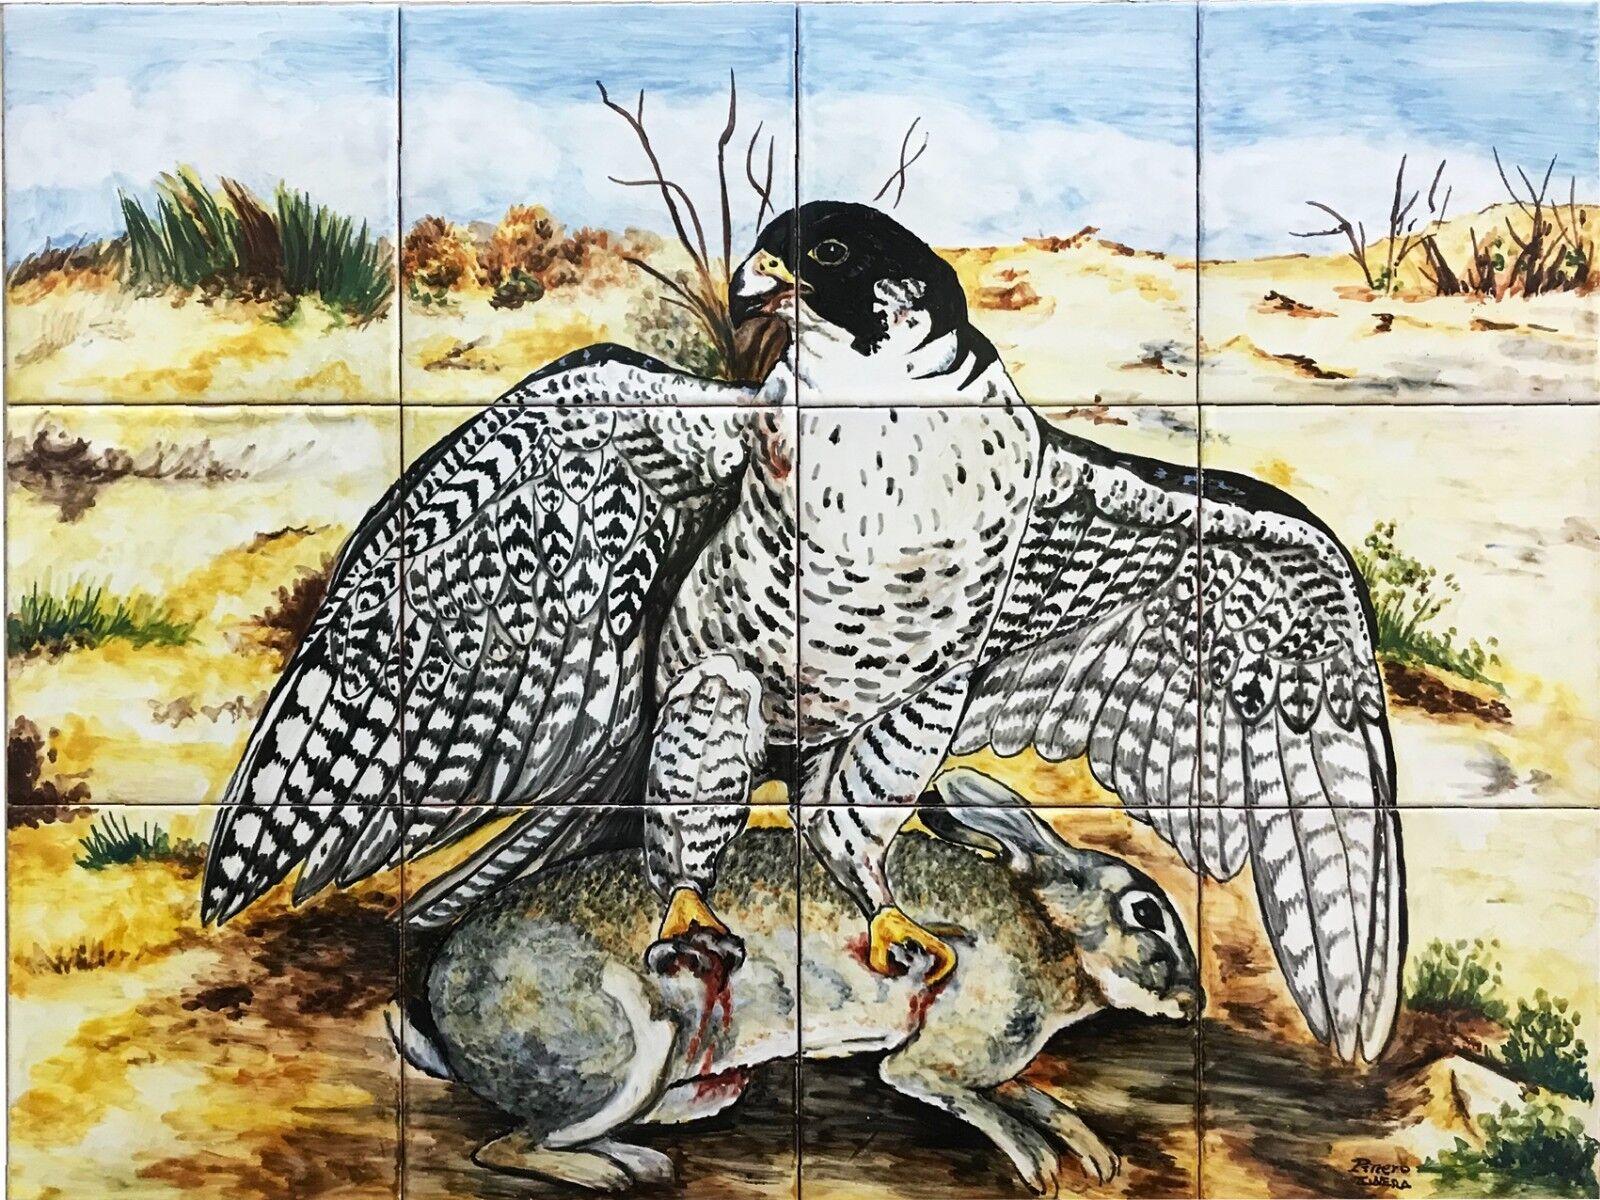 Mural Hand Painted Peregrine falcon attacks rabbit 12 tiles Spanish ceramic